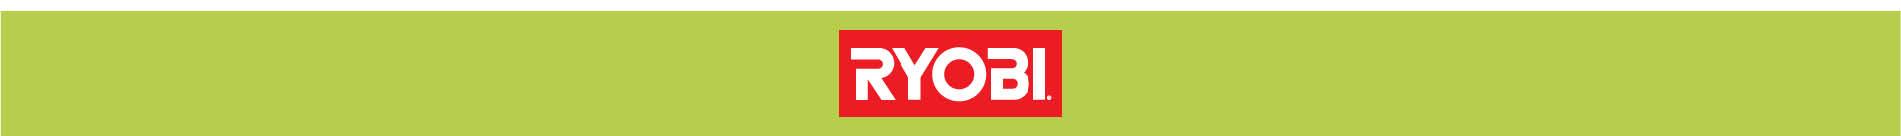 Ryobi Brand Banner